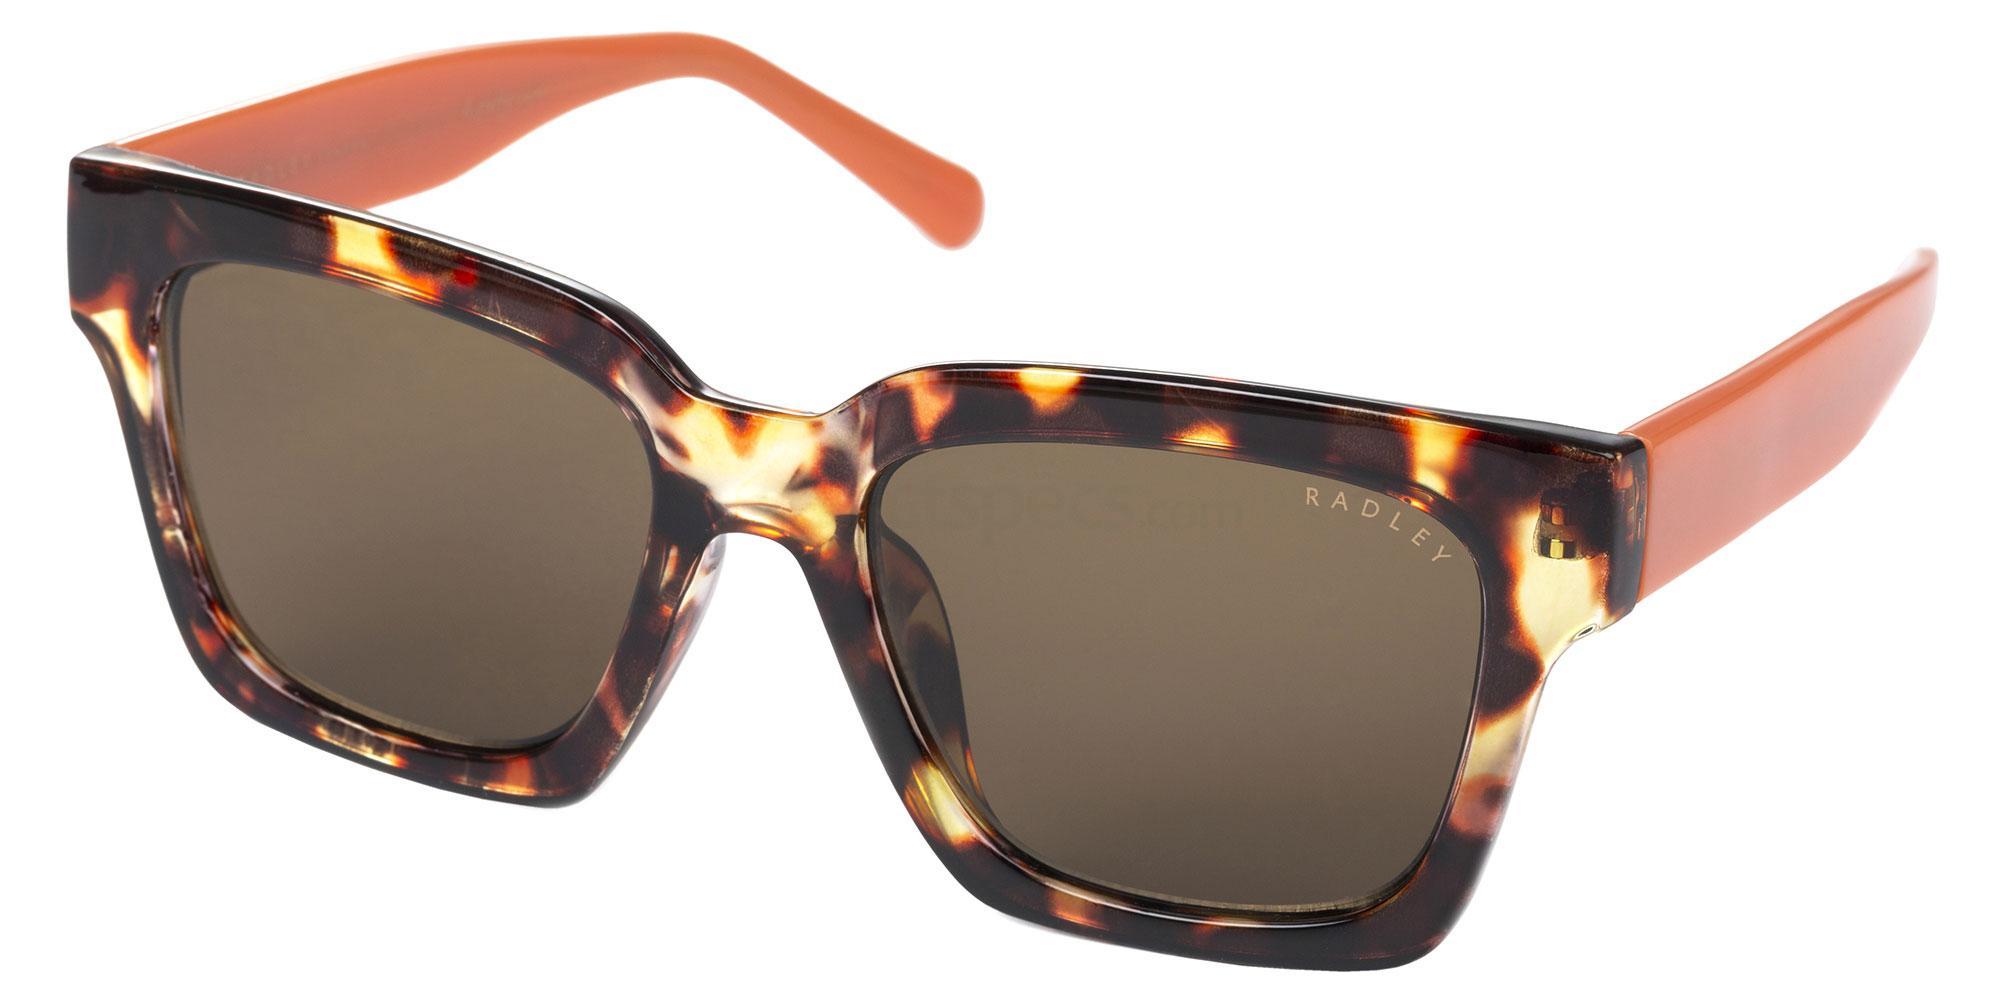 102 RDS-MINA Sunglasses, Radley London